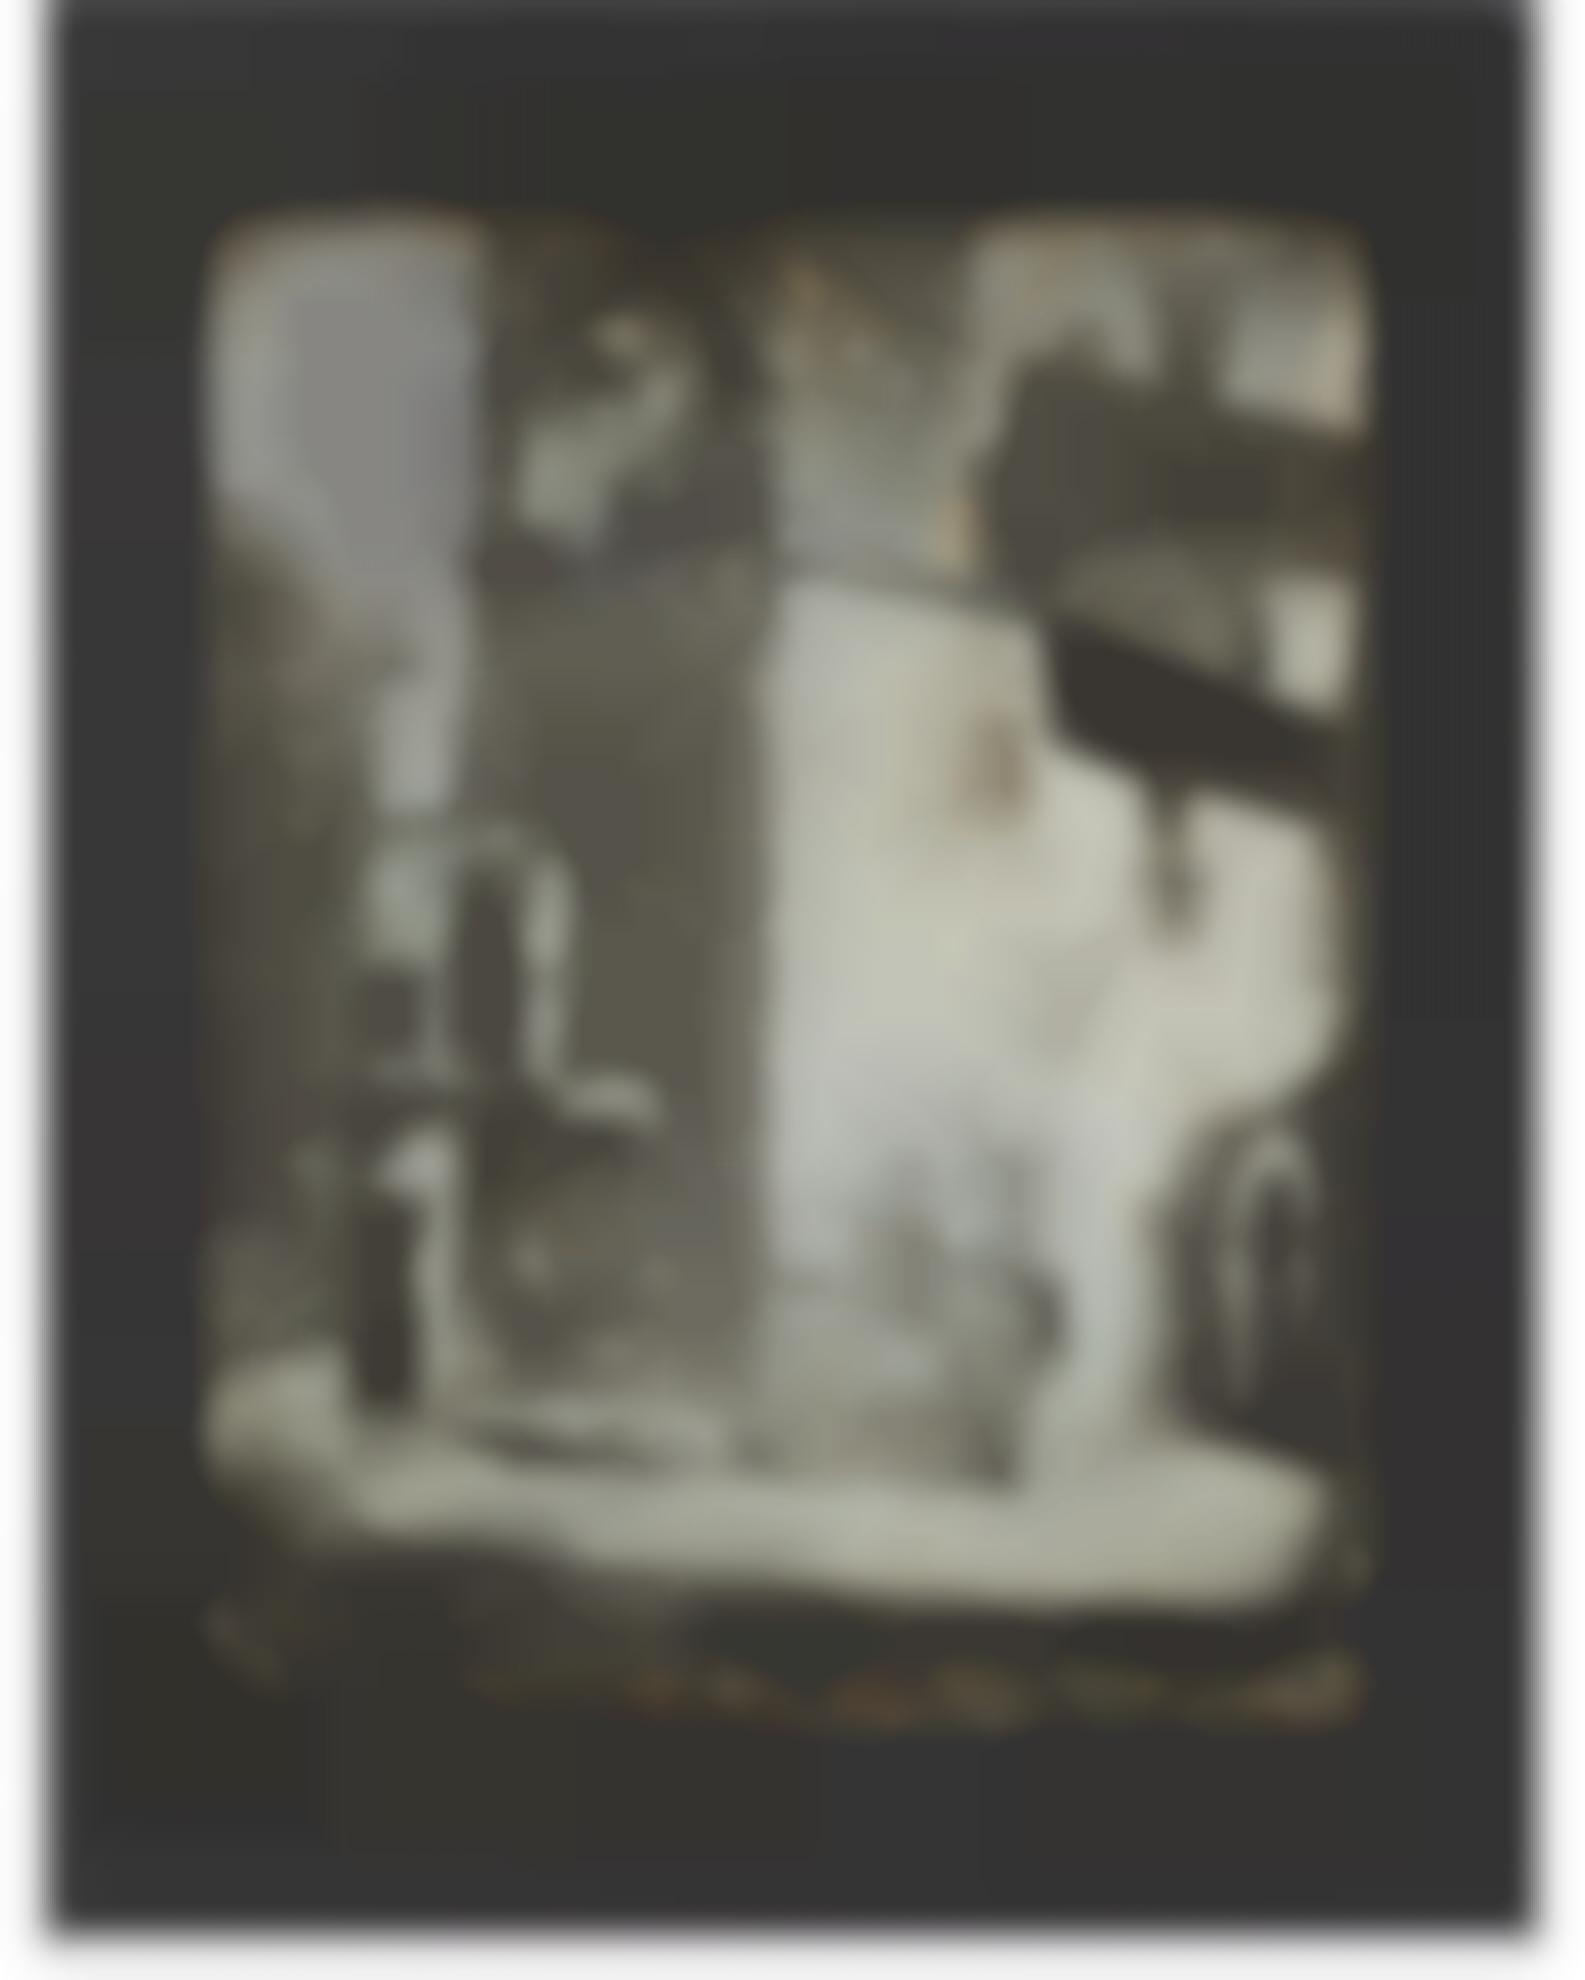 Joseph Philibert Girault De Prangey - 81. Frascati. Campanile ?-1842